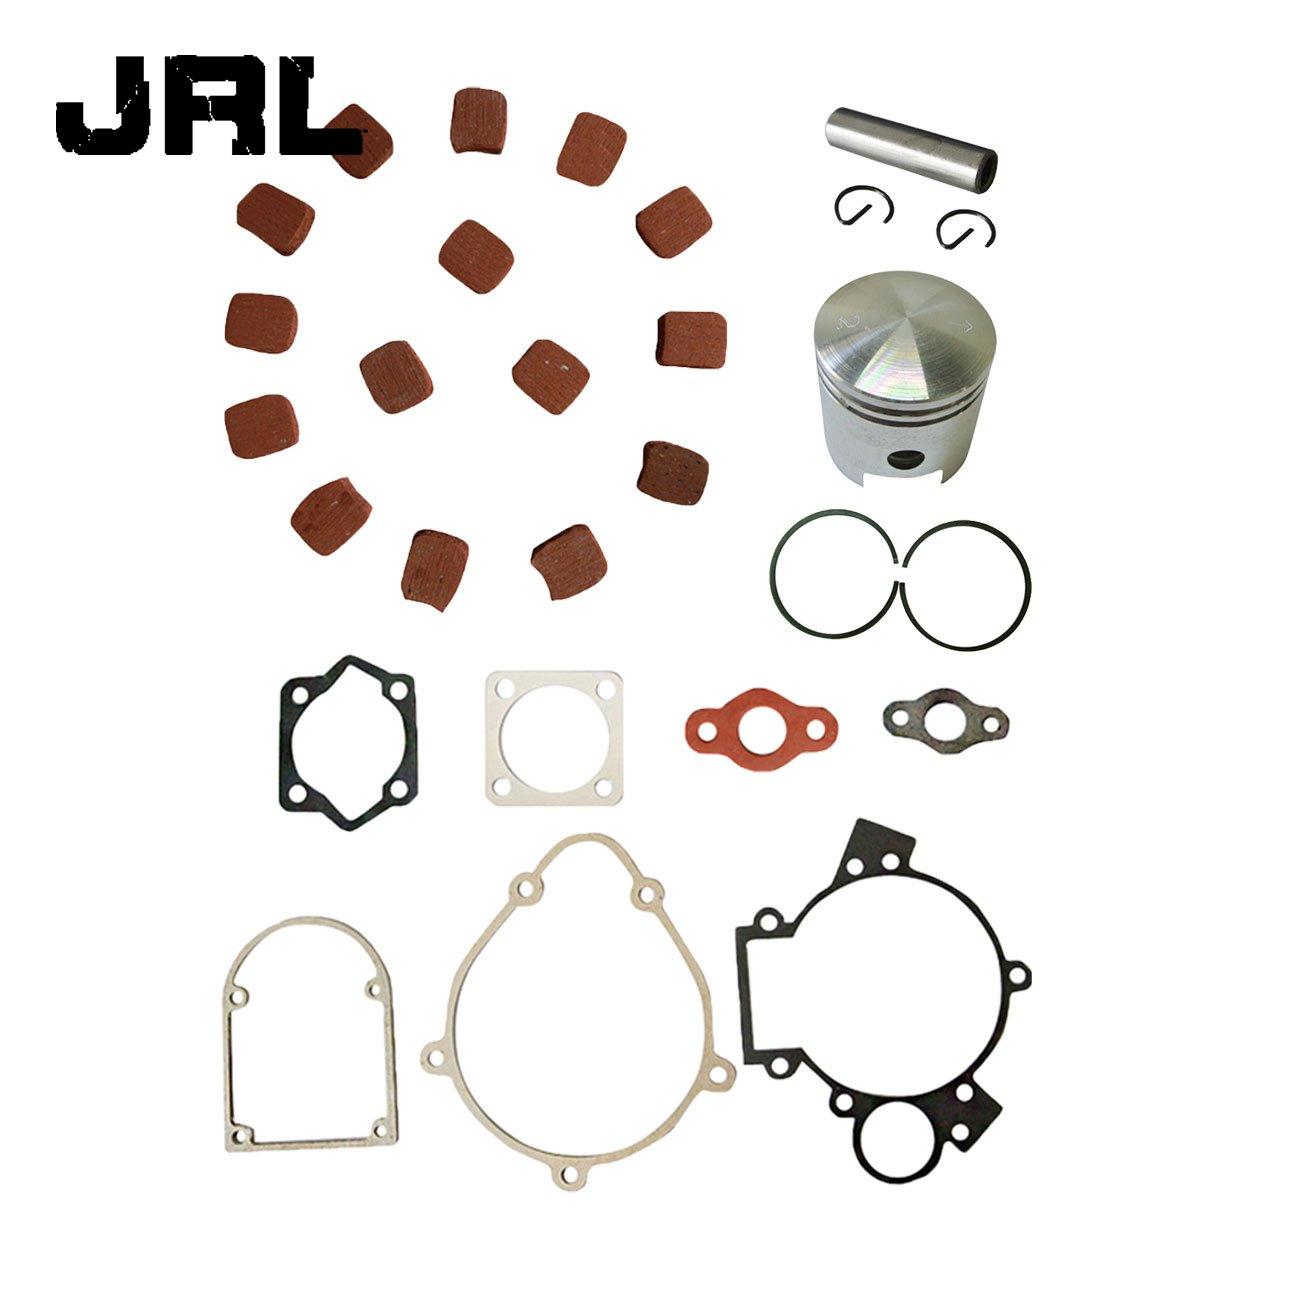 JRL The Piston Set /& Cluth Pads/& Gasket Set for 66cc 80cc Motorized Bike